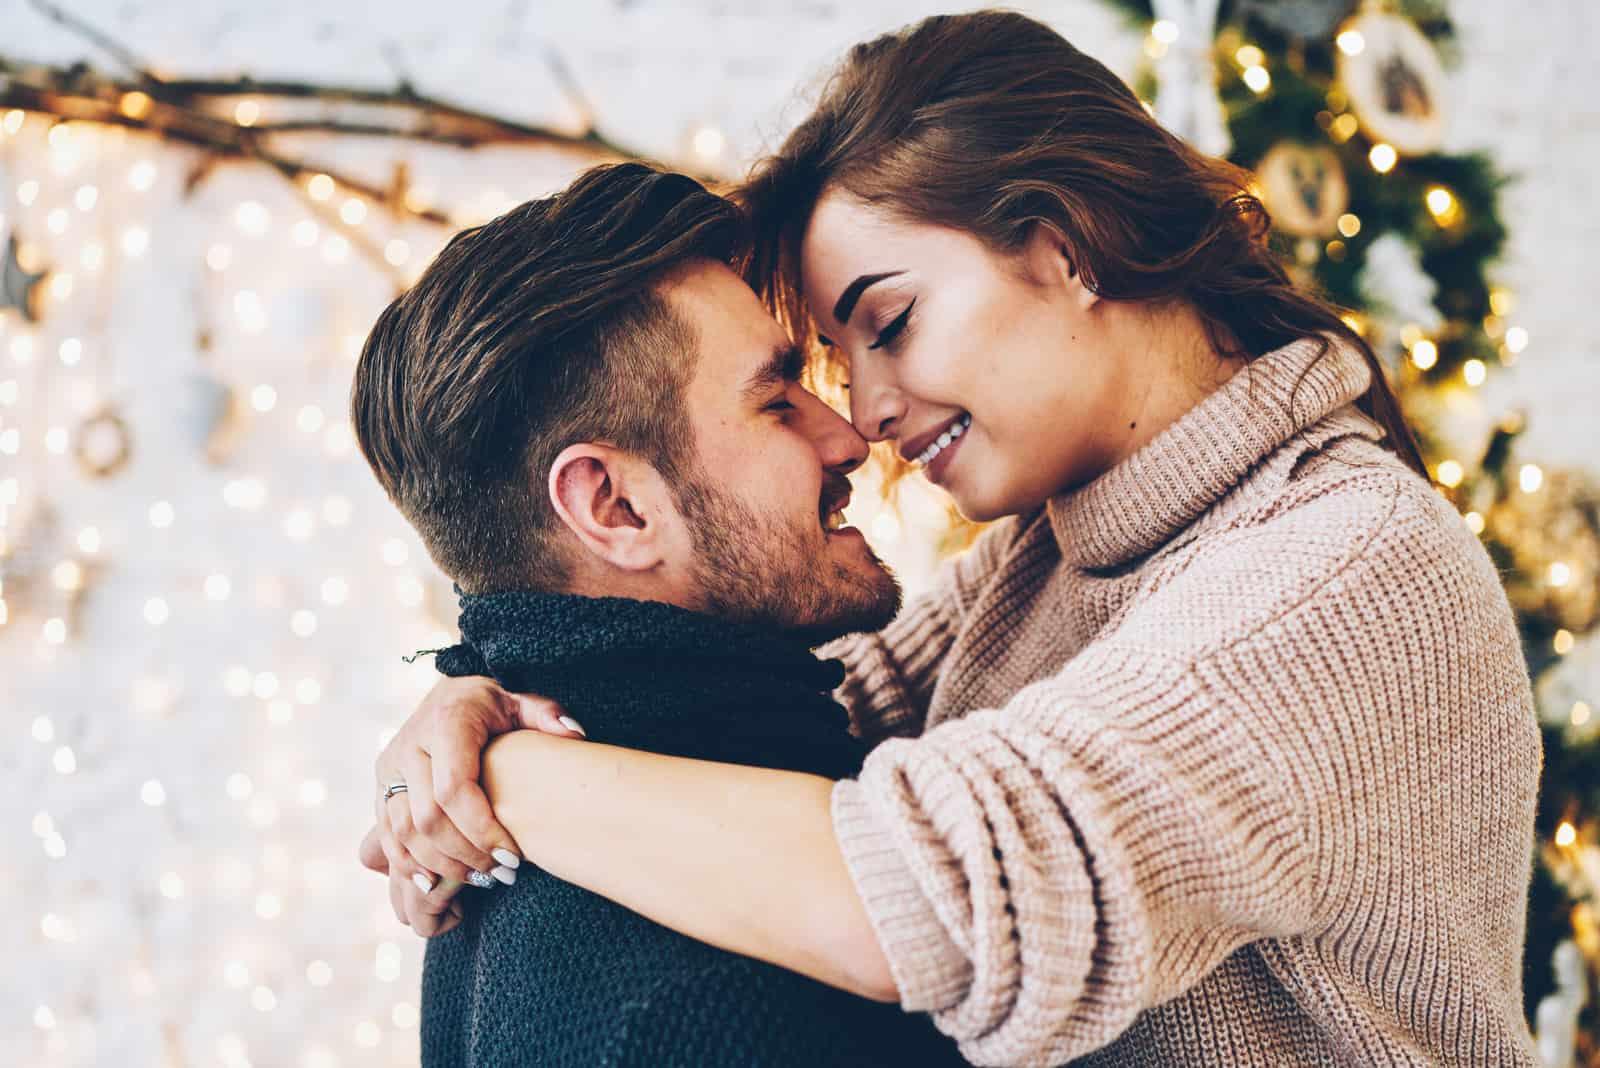 Romantic couple in love feeling happiness